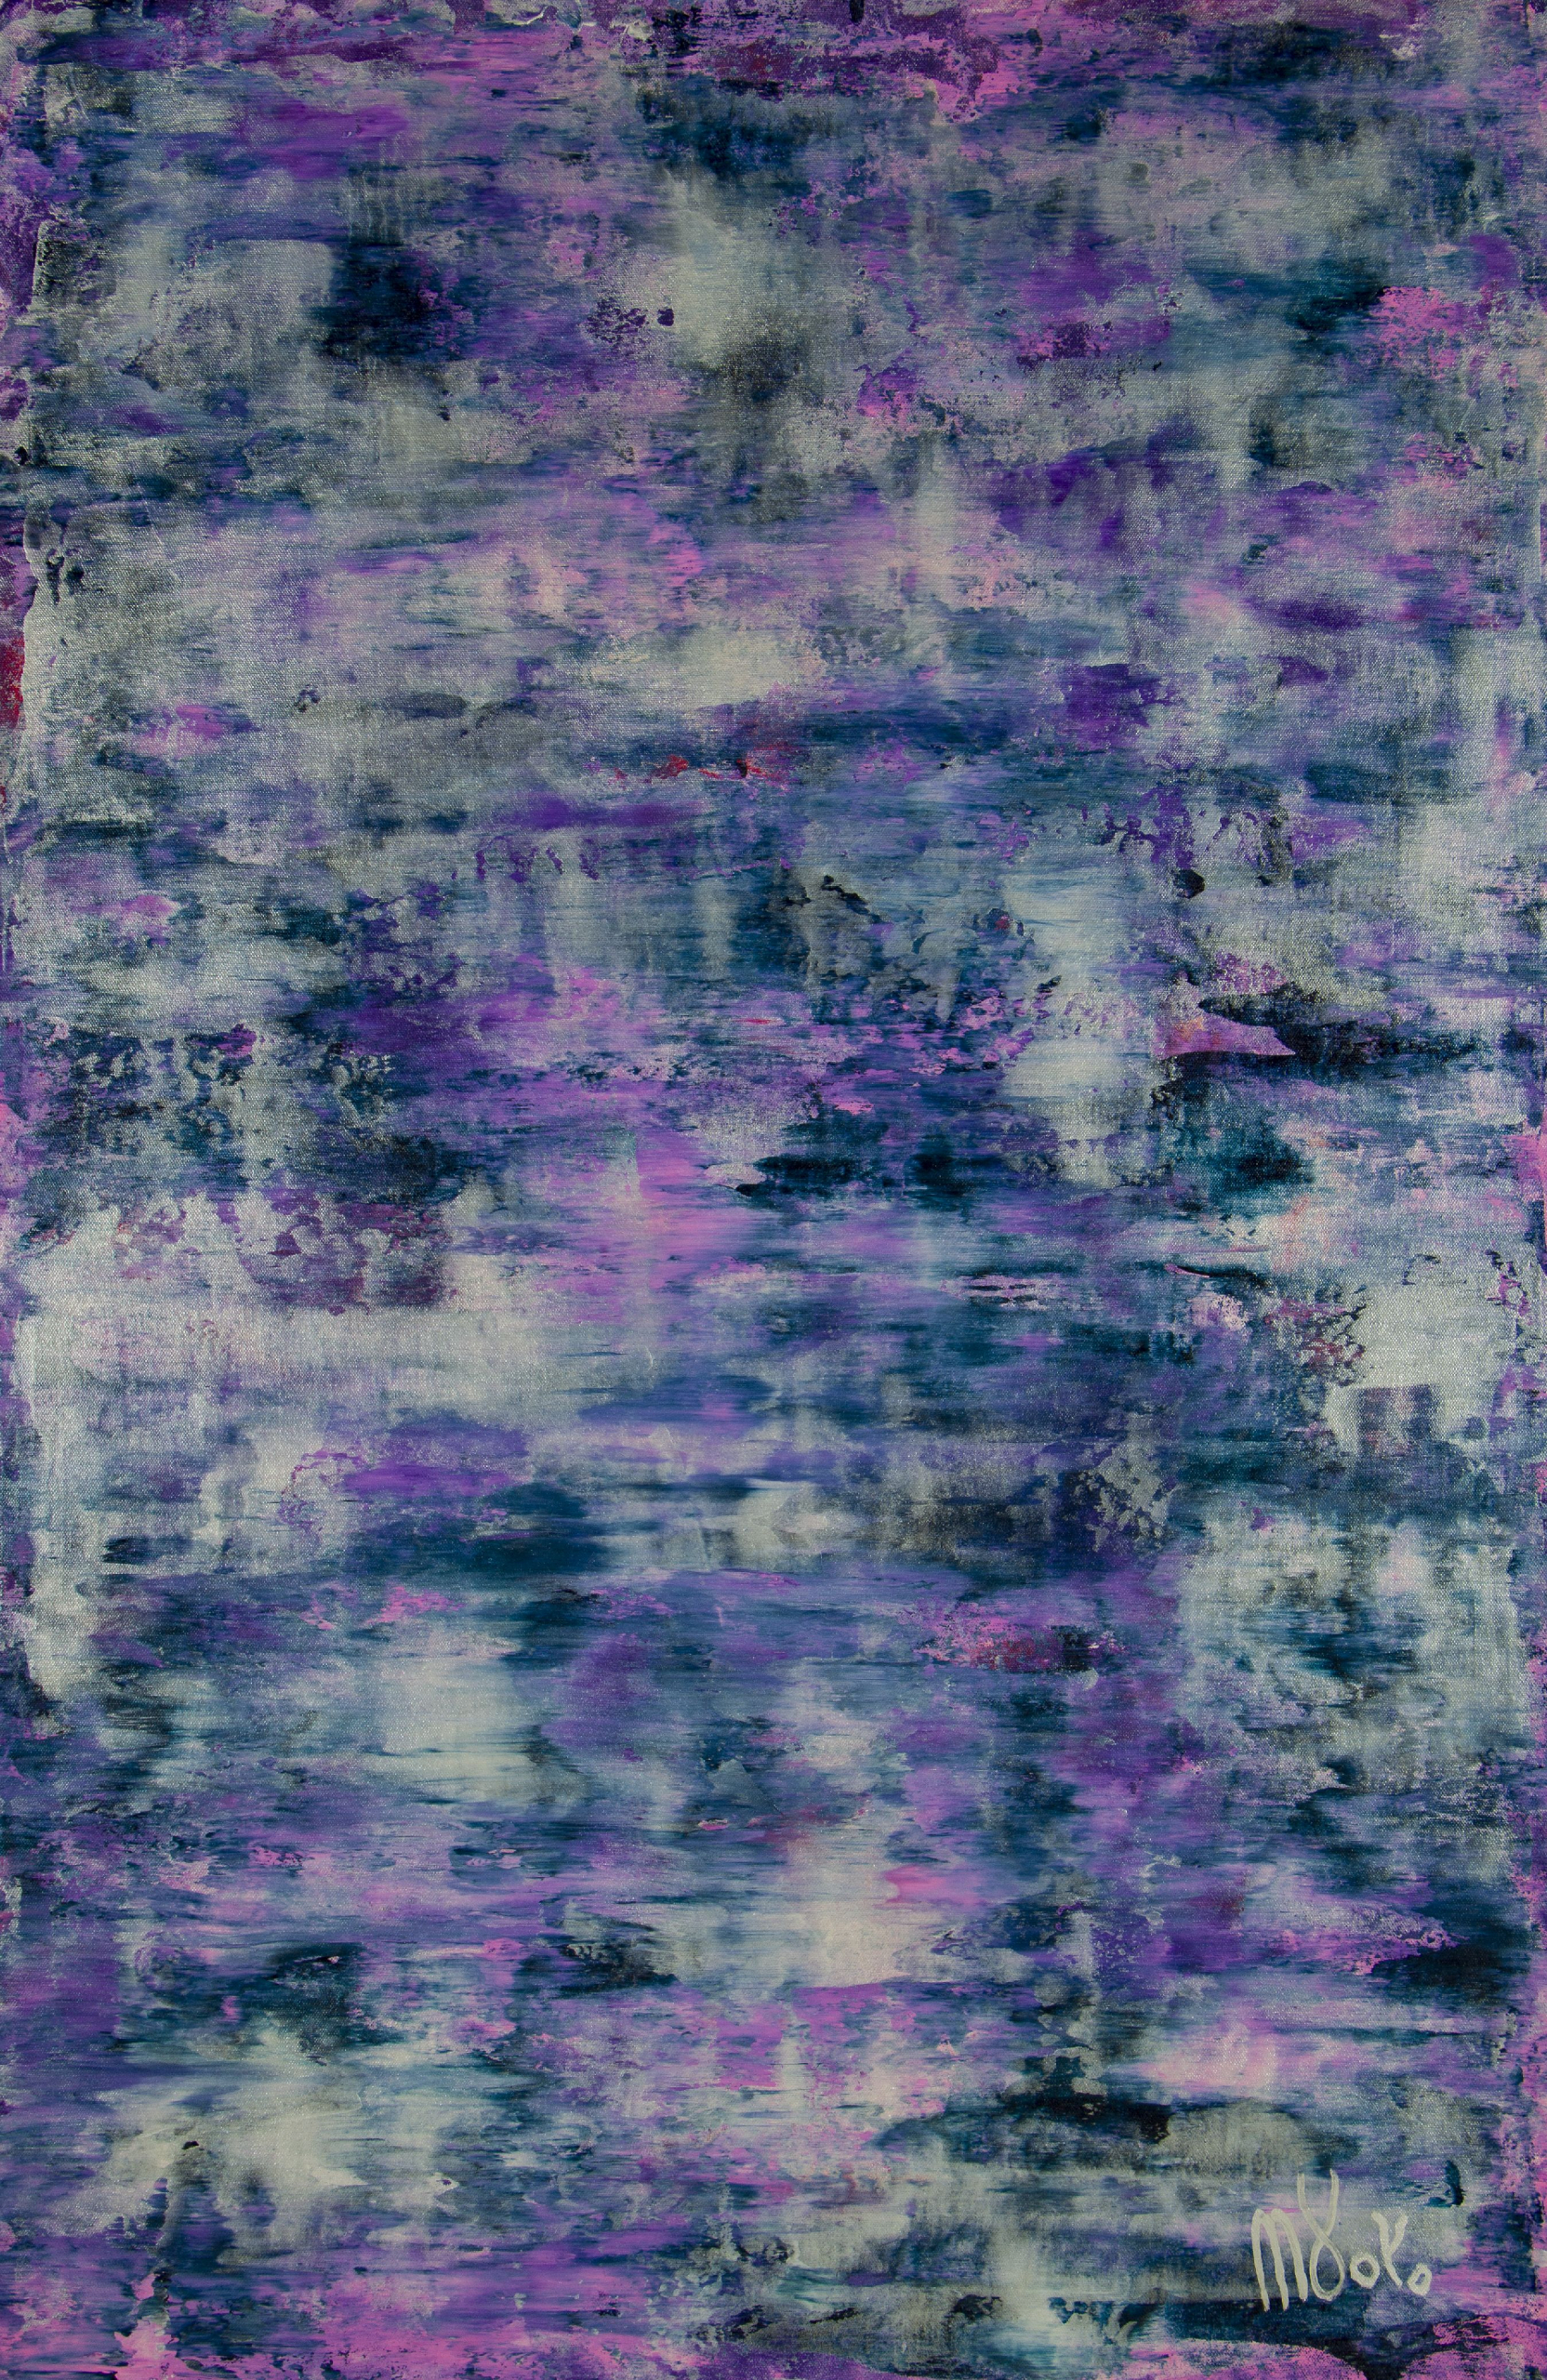 Silver Clouds (Over Purple) / (2020) by Nestor Toro